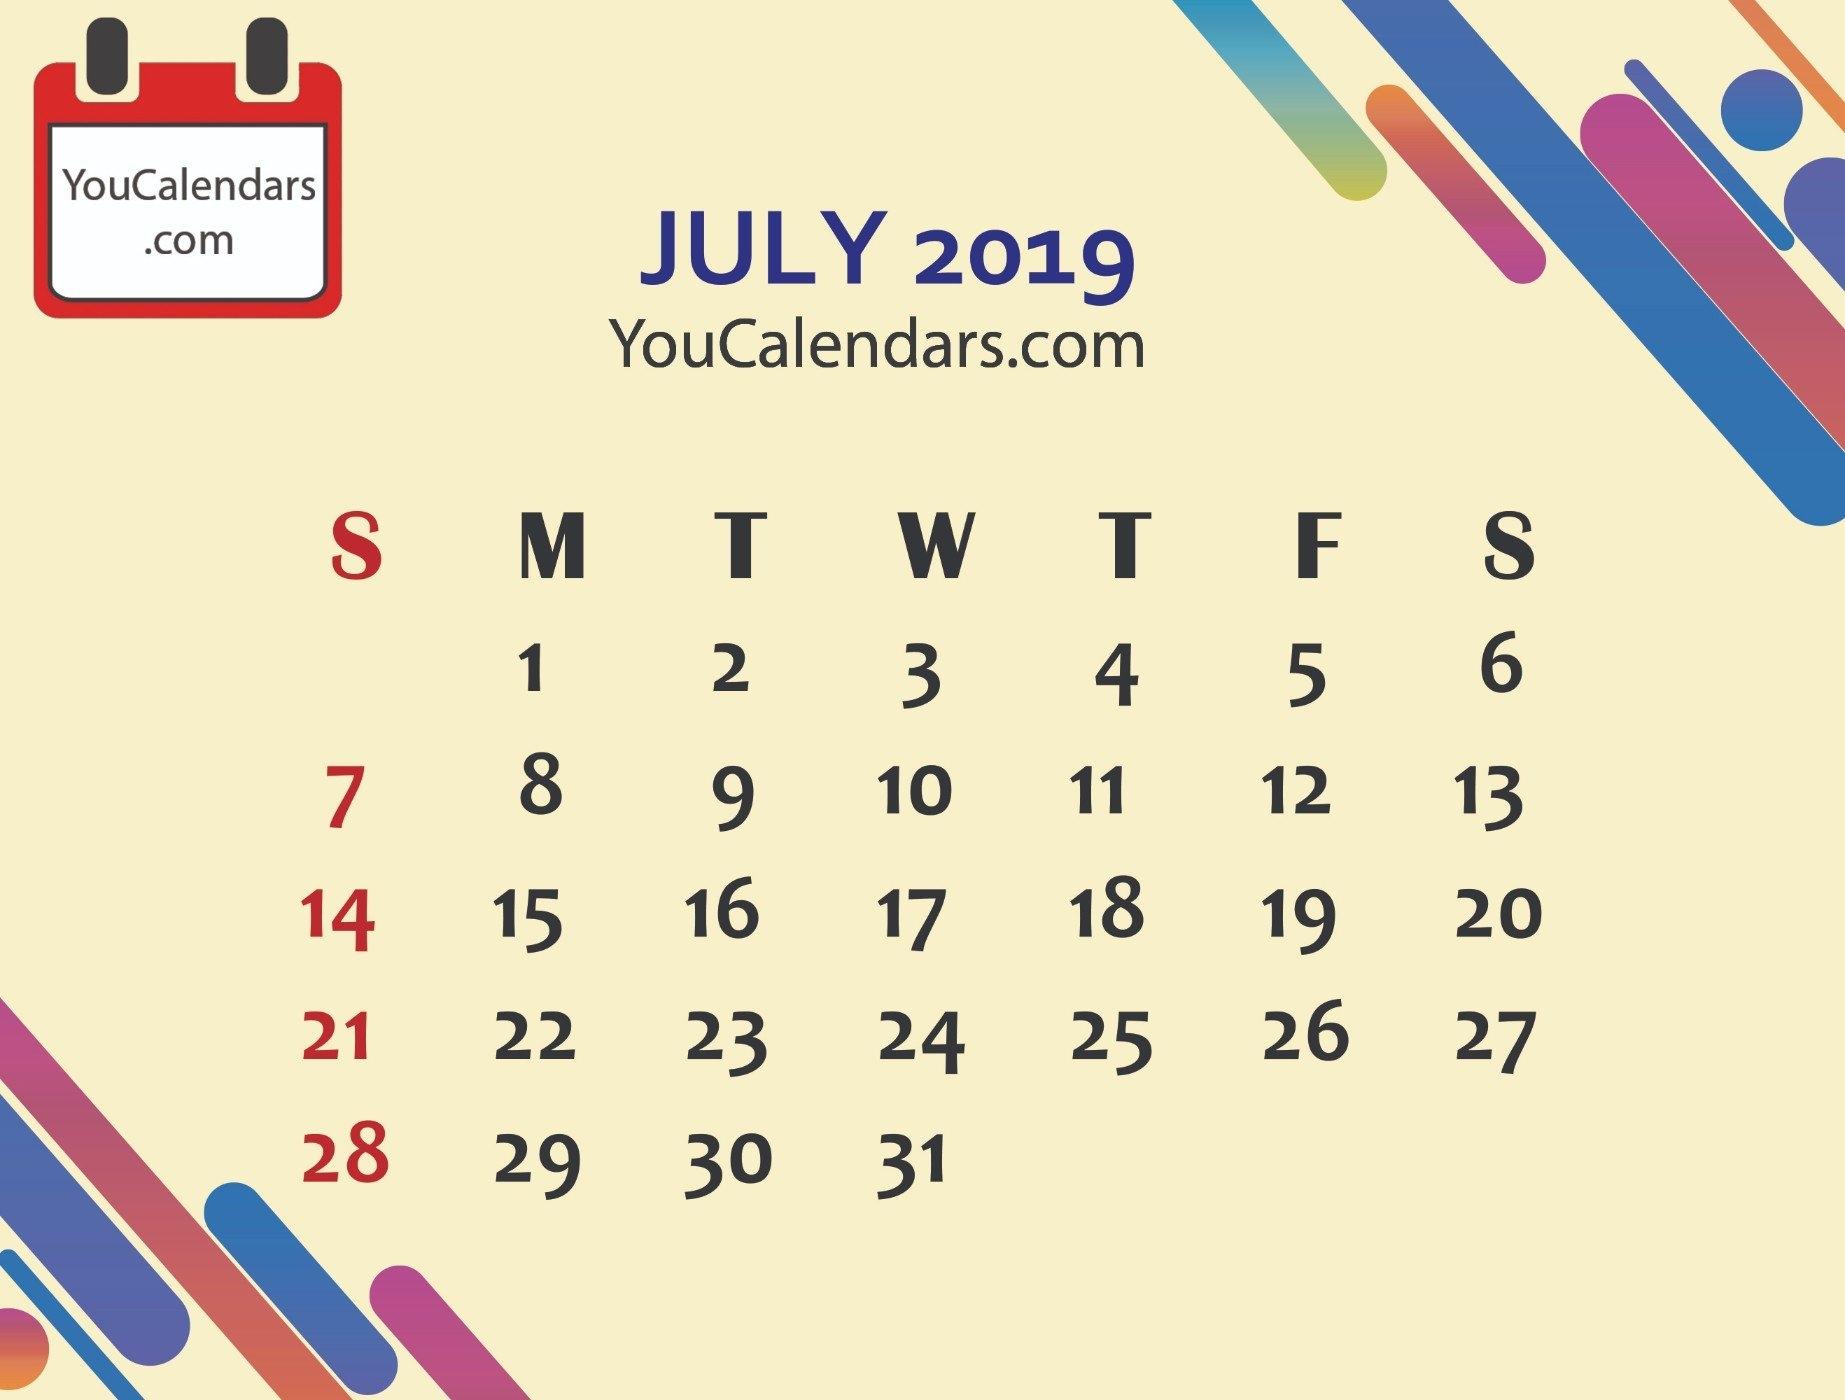 Free July 2019 Calendar Printable Template - You Calendars July 9 2019 Calendar